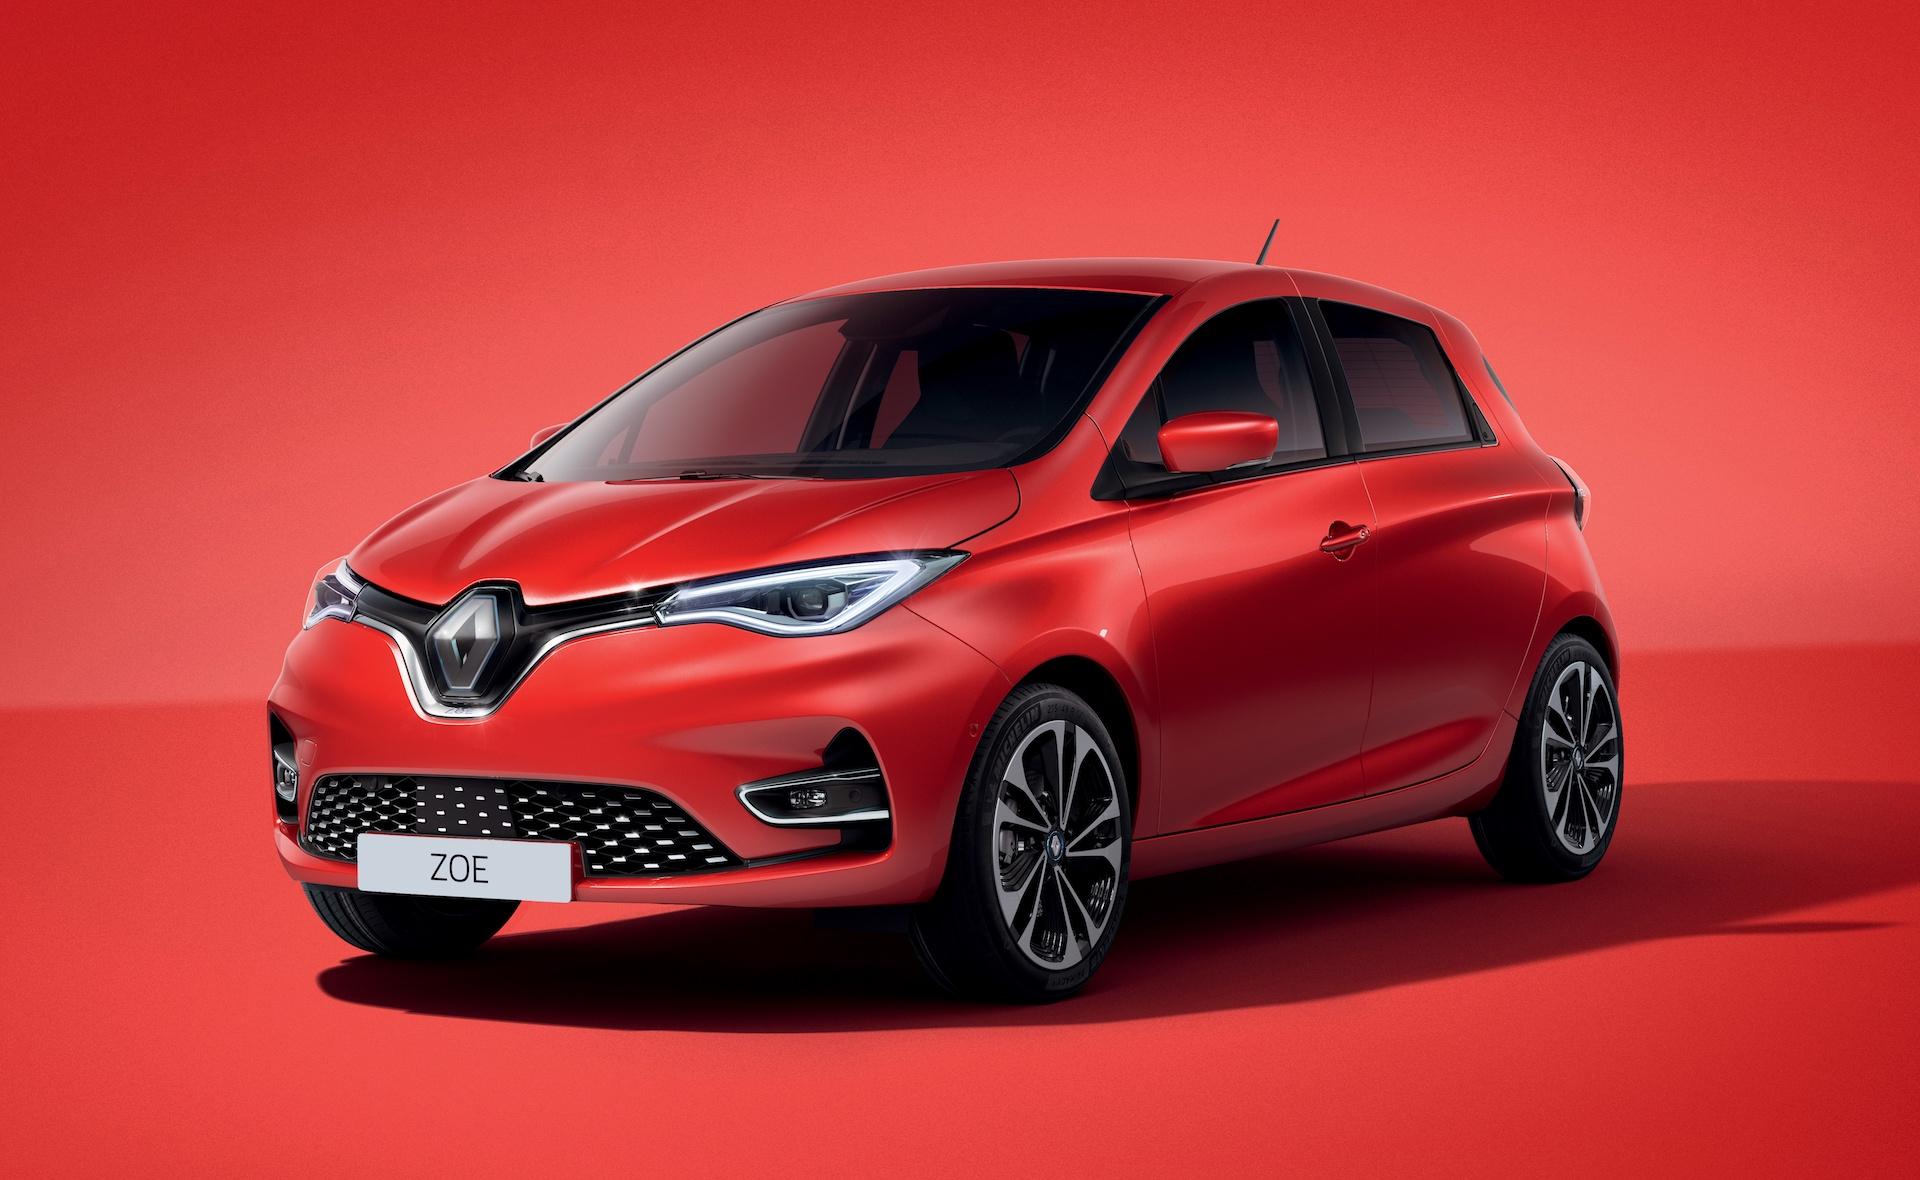 Renault Zoe red